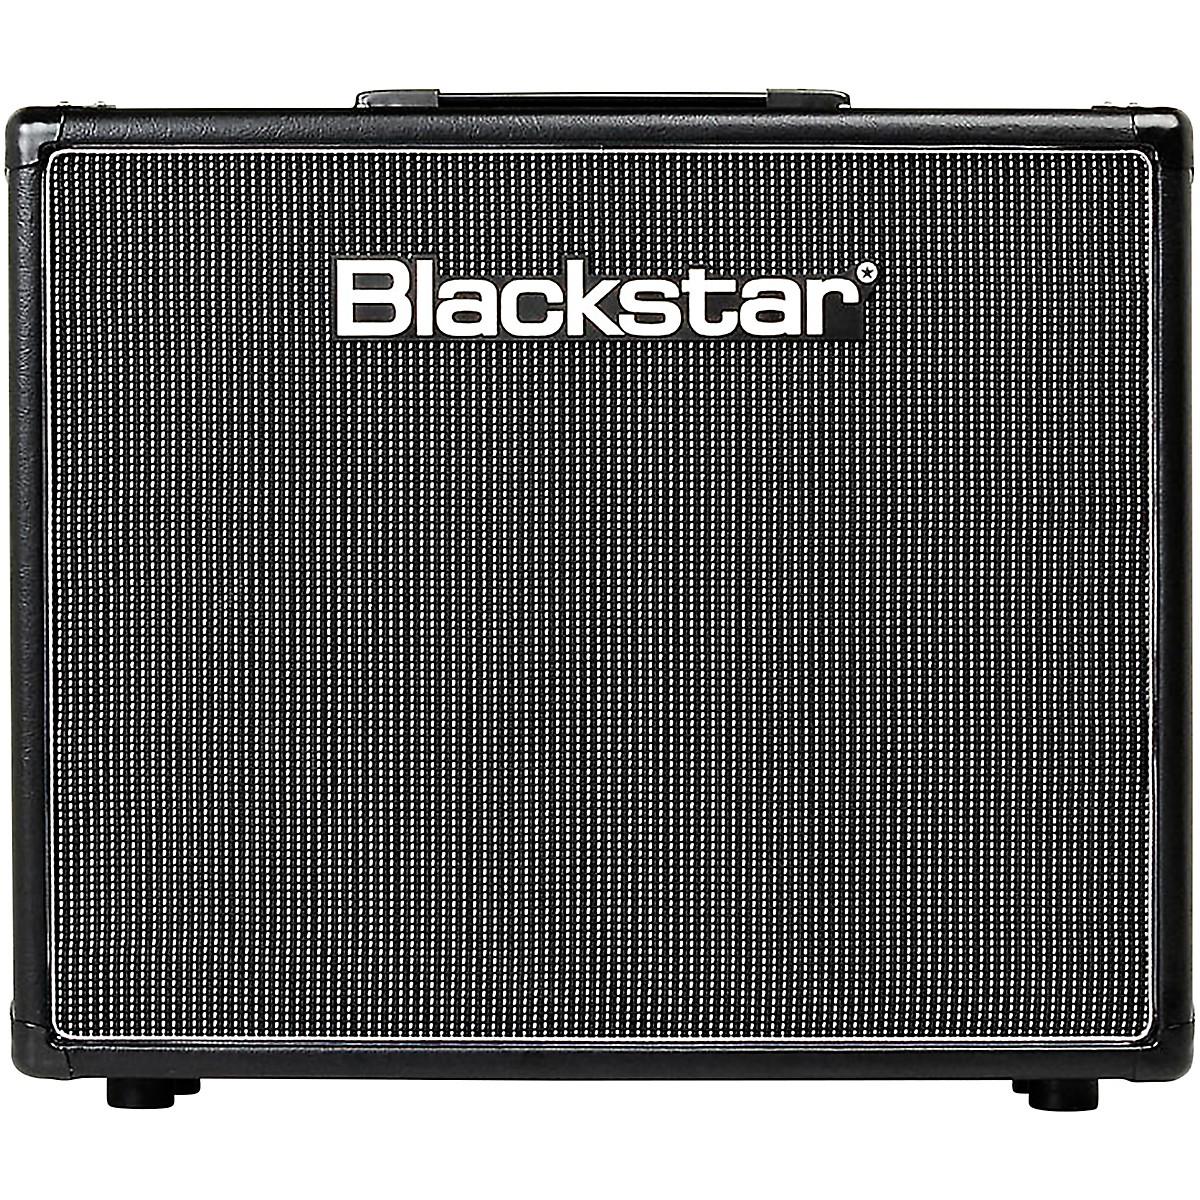 Blackstar HTV 112 HT Venue Series MKII 1x12 Extension Speaker Cabinet